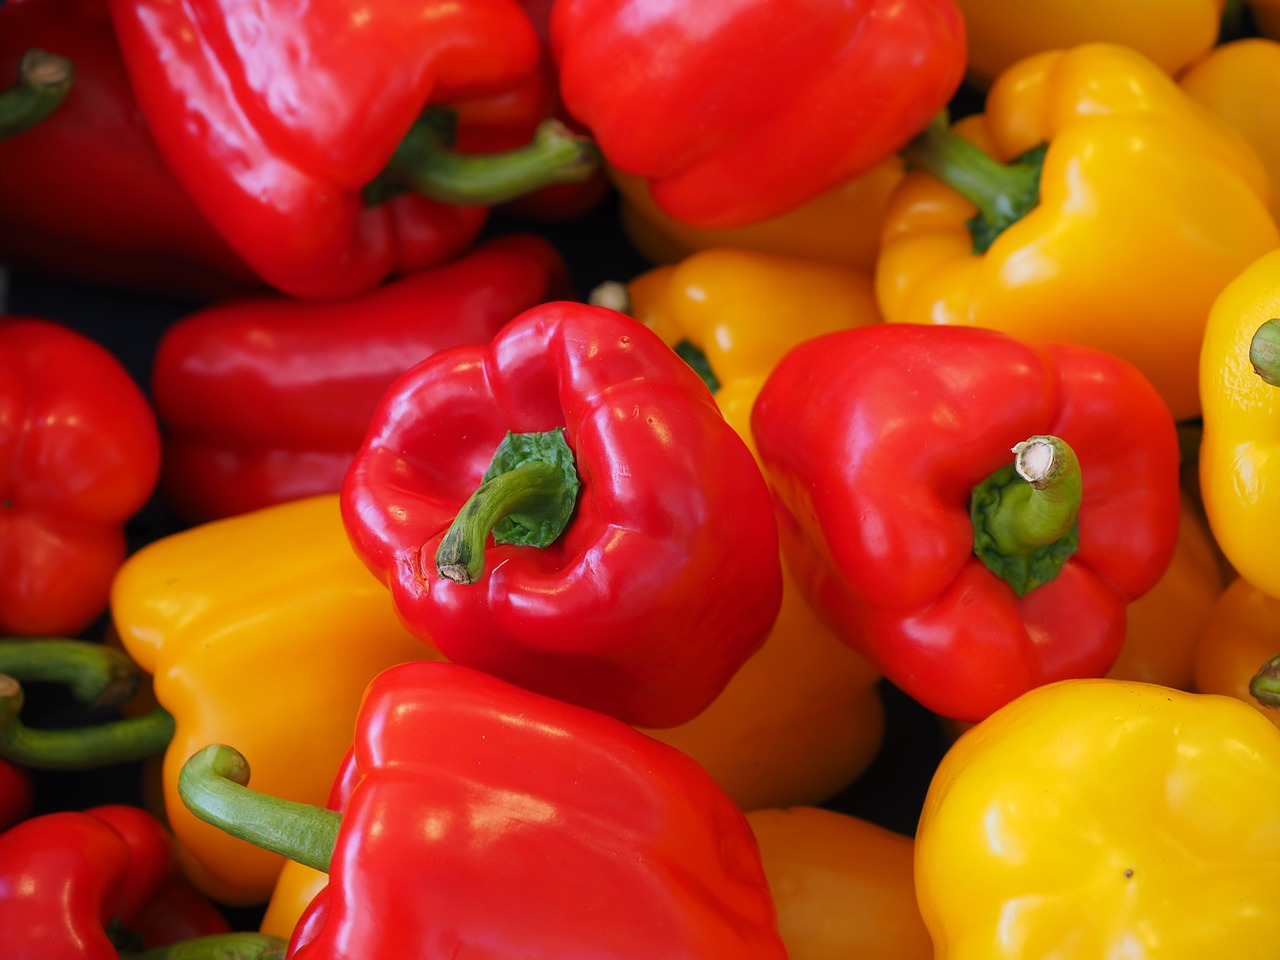 Pepper Tatashe (Red bell peppers)